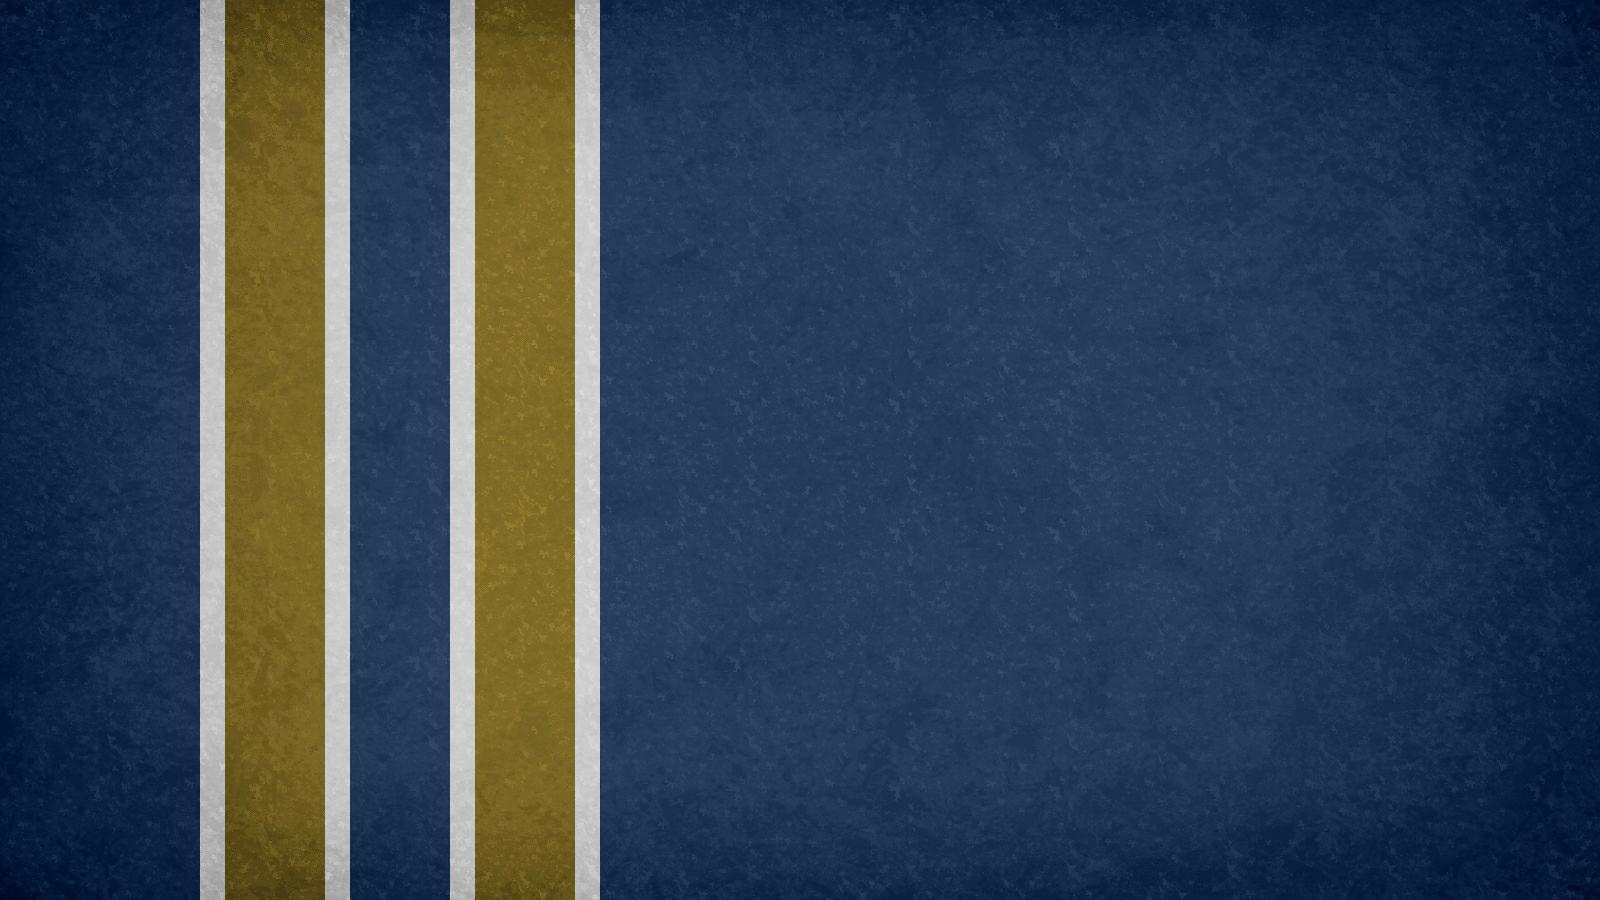 gold_stripes_by_orangeman80-d